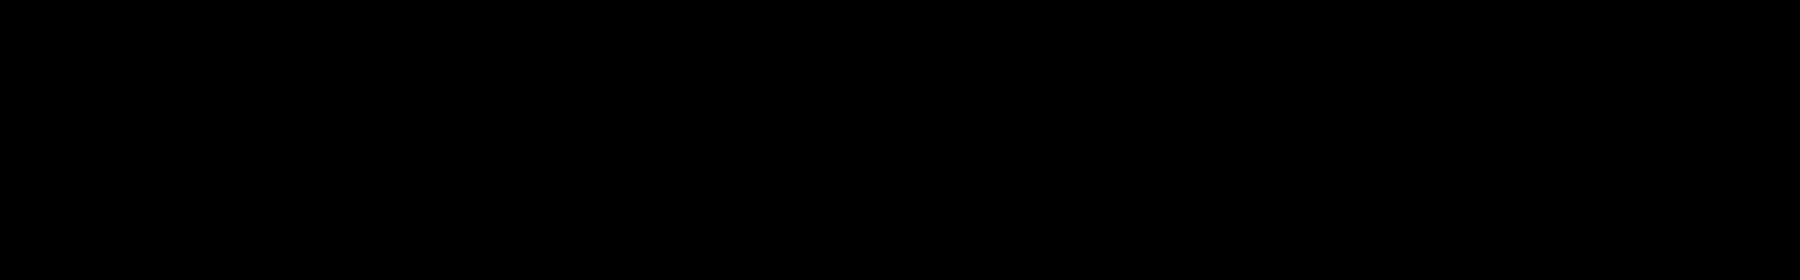 GANG audio waveform